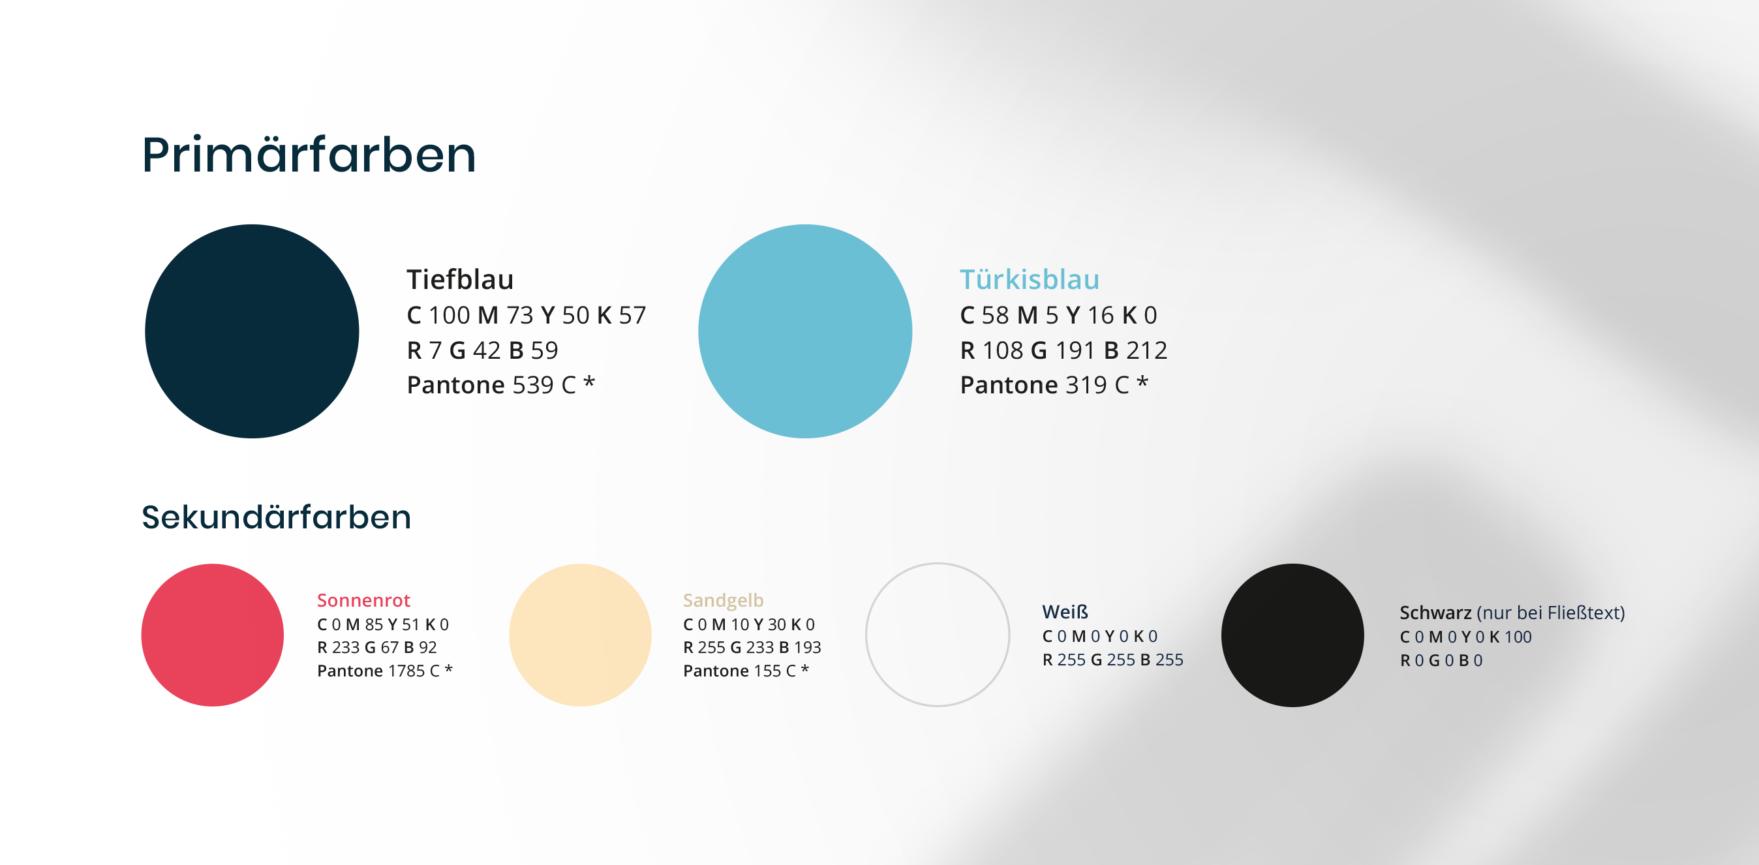 balearis Namensgebung und Branding Farbdefinition in CD Guide